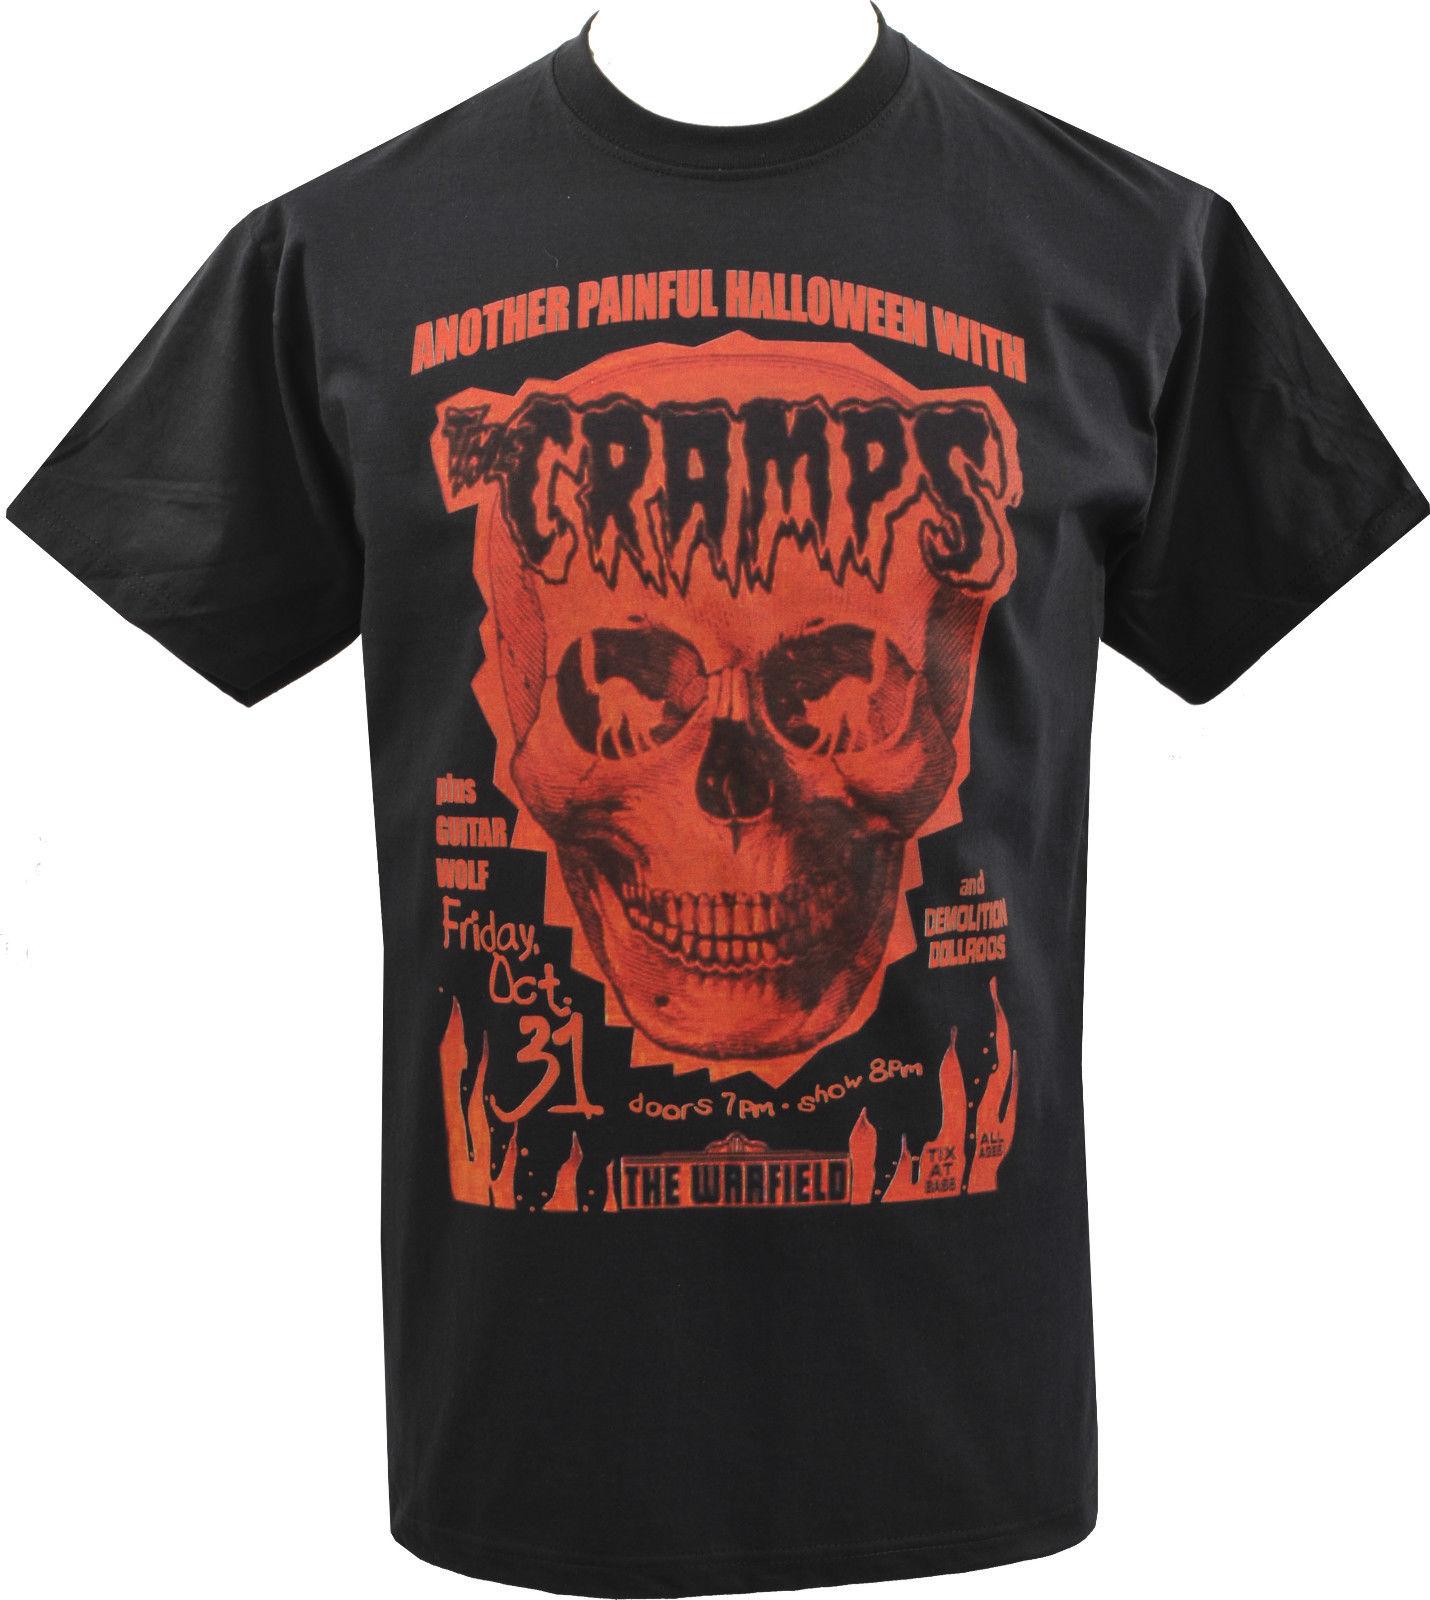 Camiseta de hombre THE CRAMPS HALLOWEEN SKULL LUX INTERIOR PSYCHOBILLY GARAGE S-5XL moda estilo hombres Tee envío gratis barato